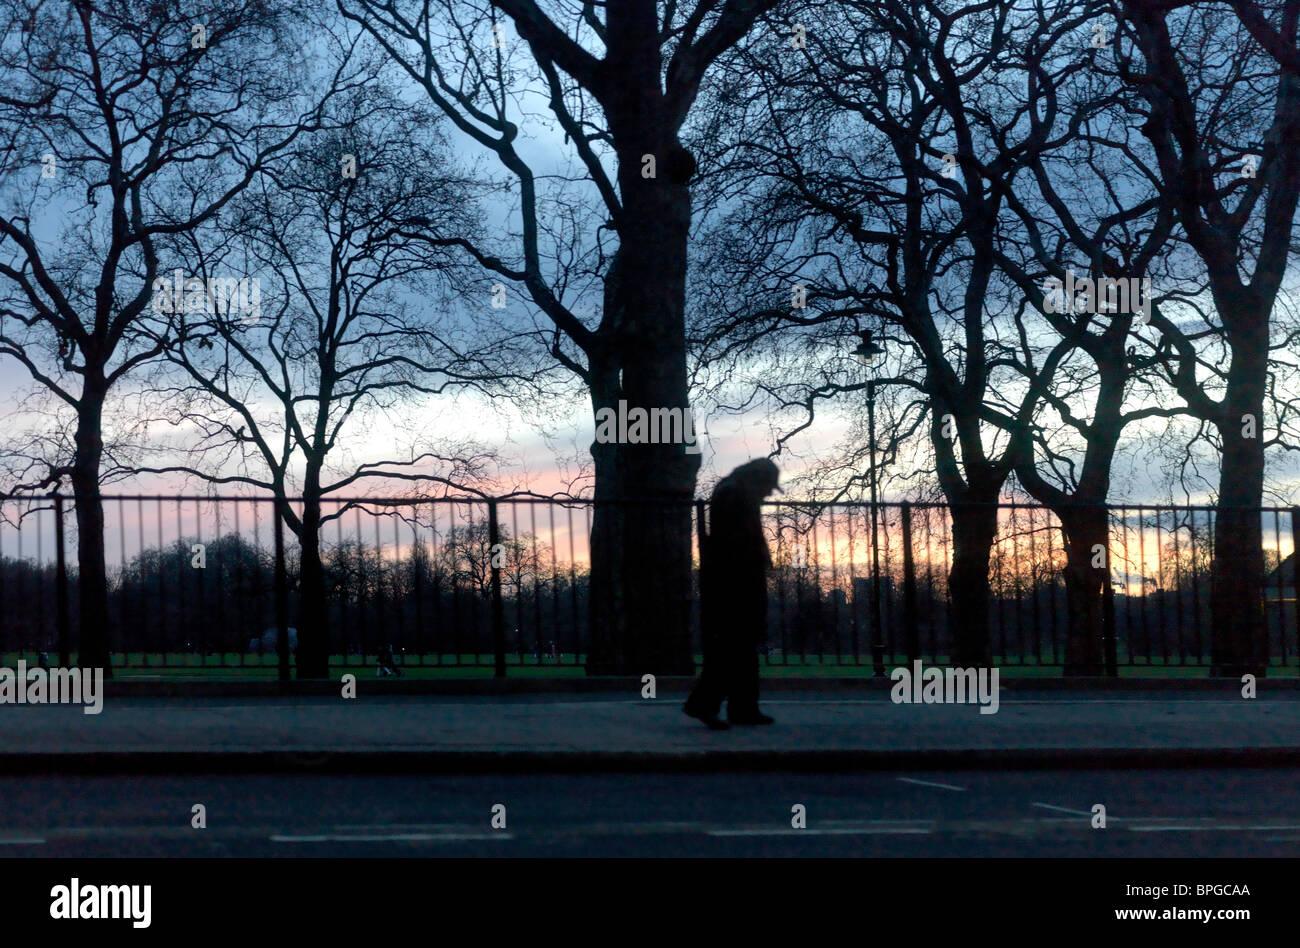 London England London Embankment Trees At Sunset - Stock Image